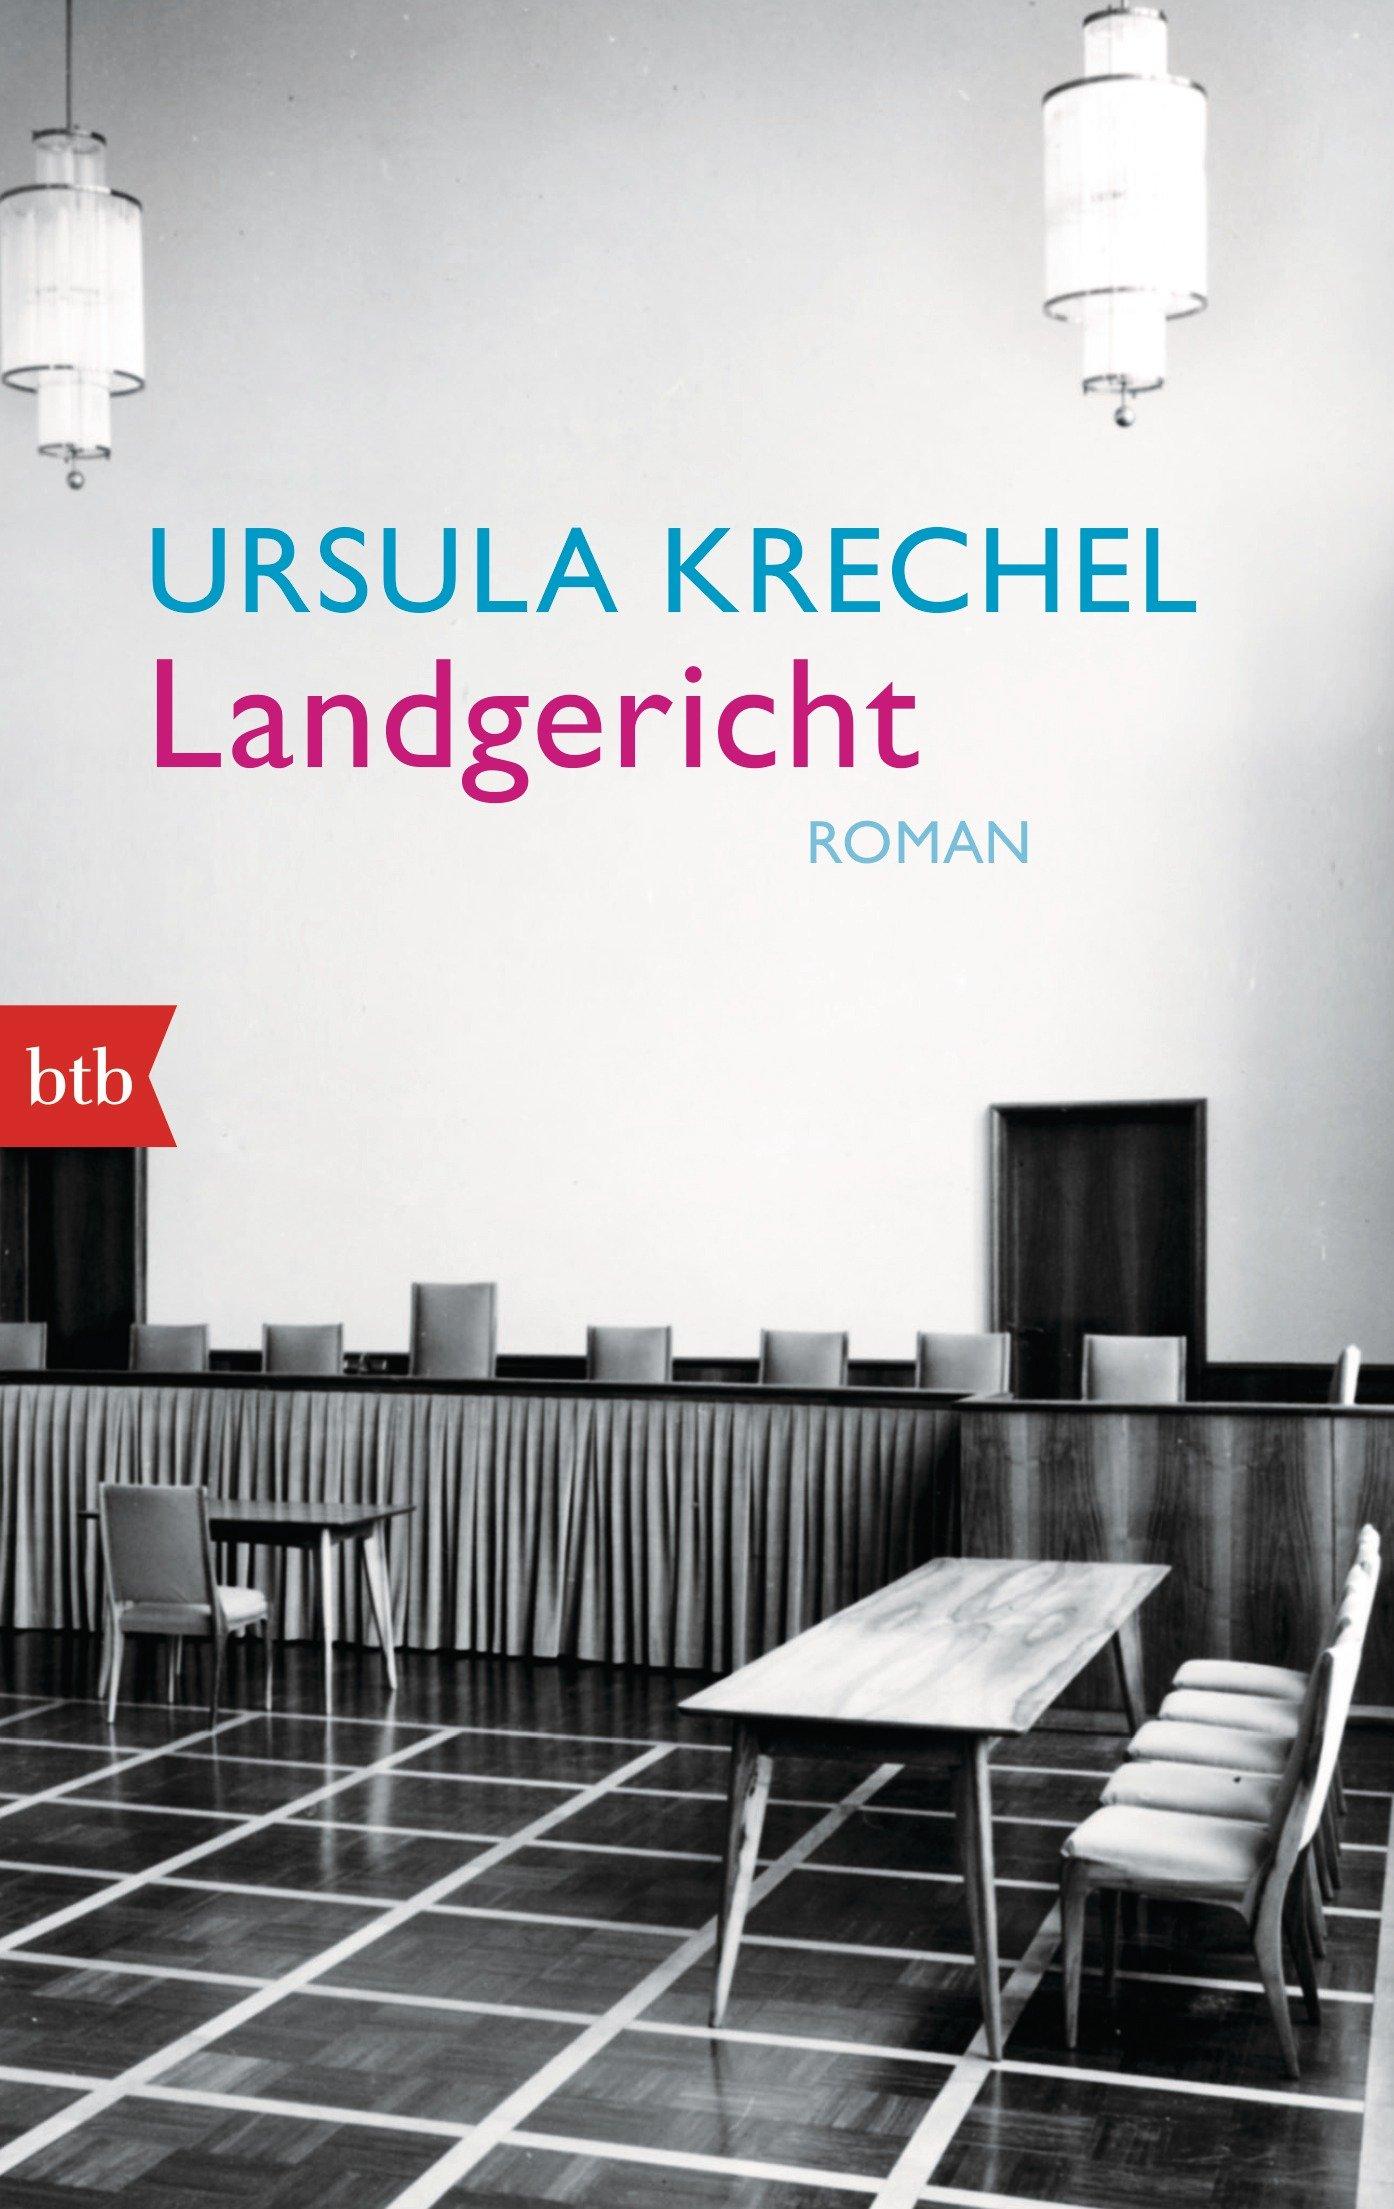 Ursula Krechel [Allemagne] 813LuX8qufL